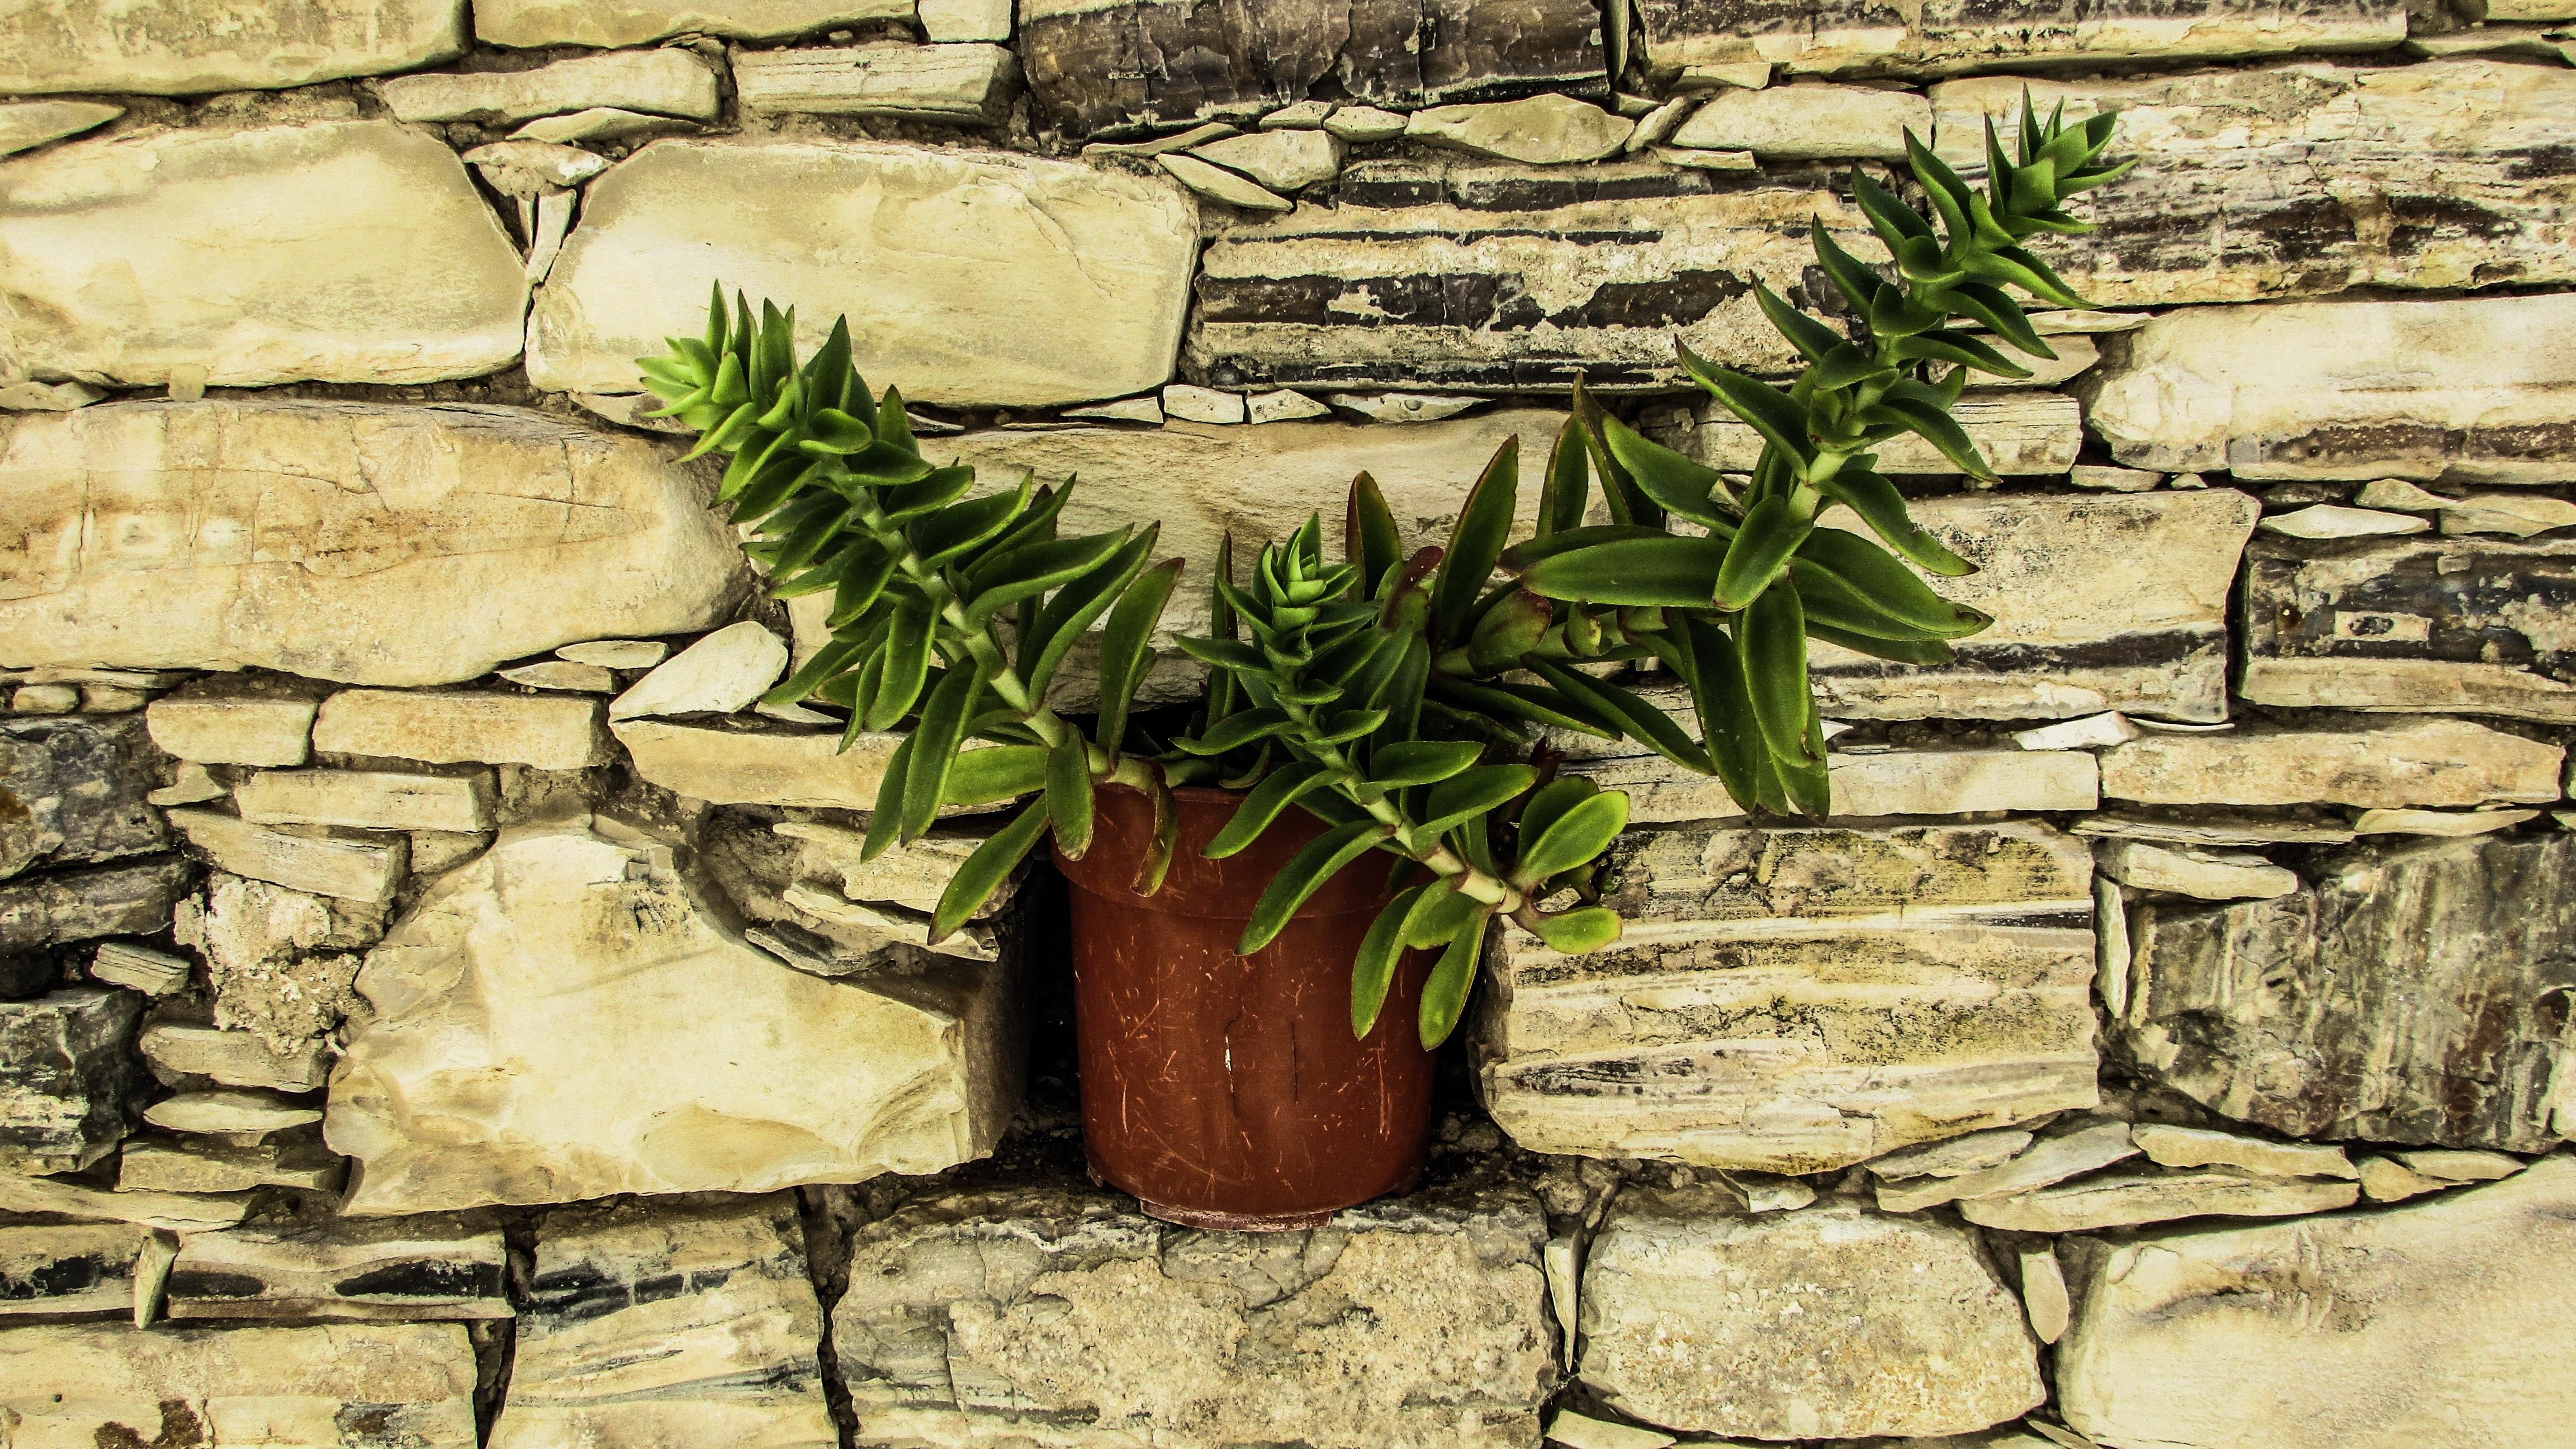 Free Images : tree, rock, branch, plant, wood, village, decoration ...